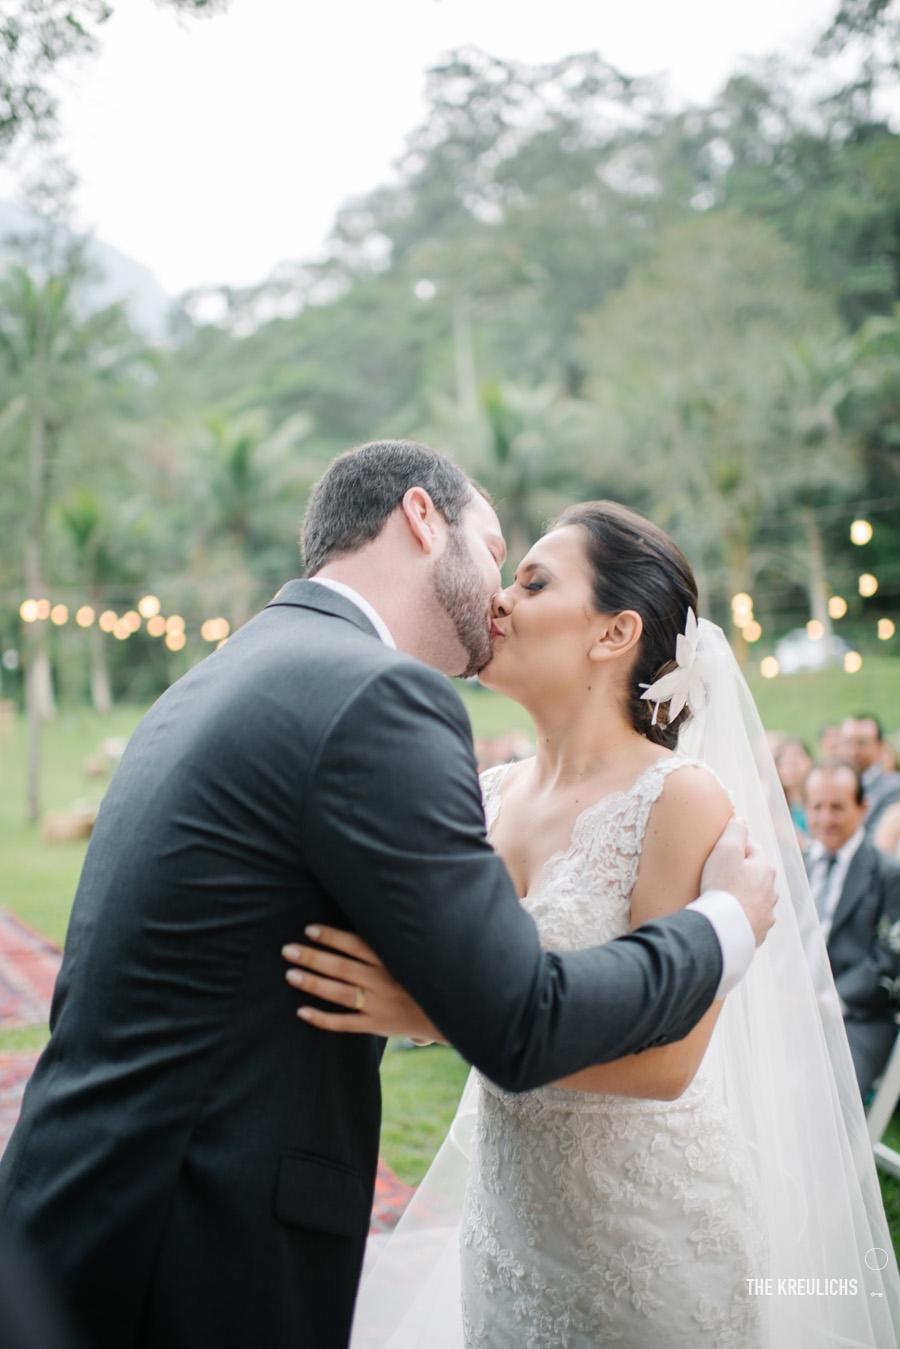 Casamento_Thalita&Dodo_THEKREULICHS225.jpg